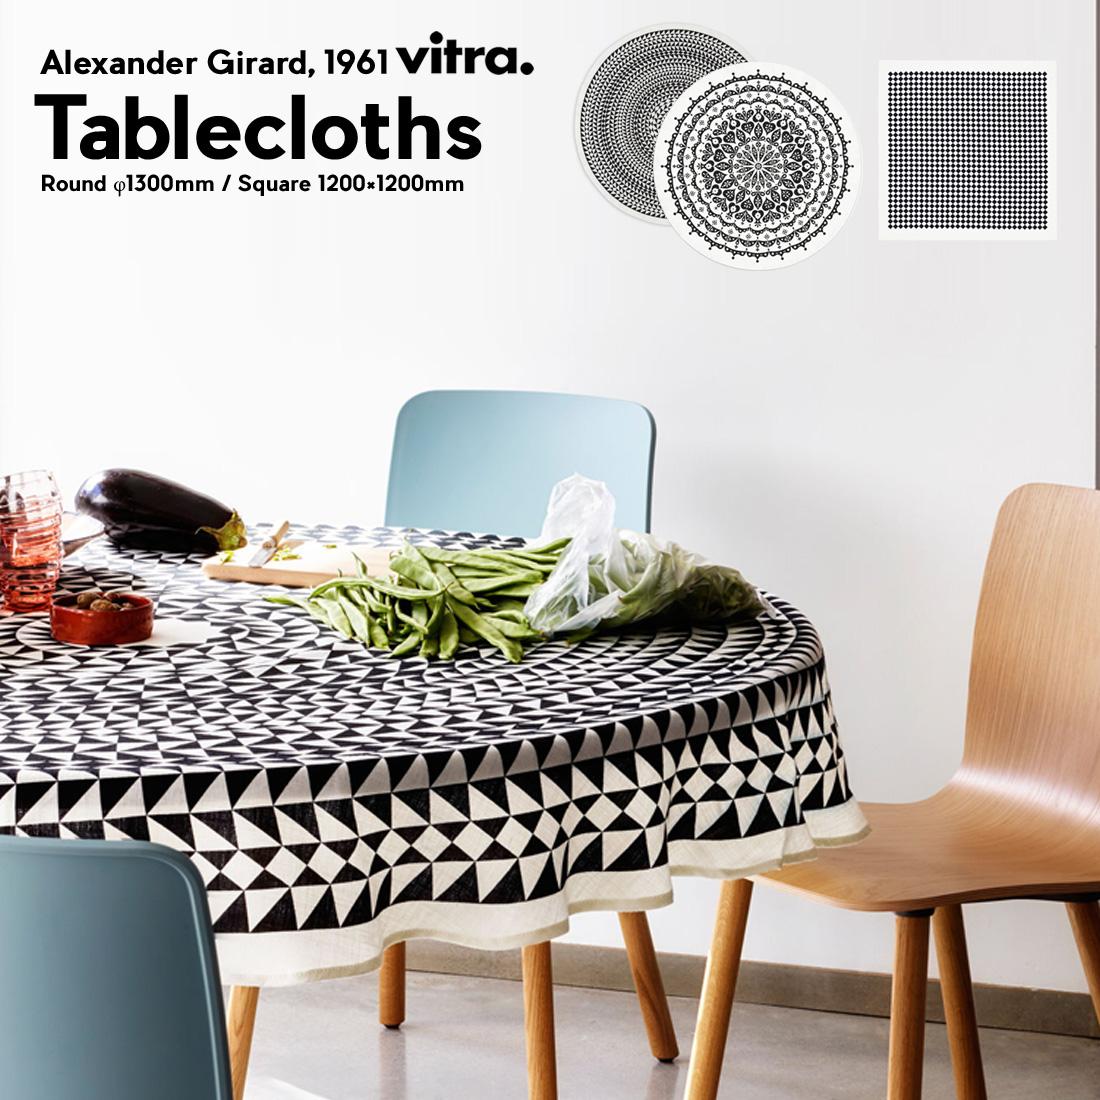 【Vitra ヴィトラ】Tablecloths テーブルクロス食卓 リビング キッチン ダイニング リネン